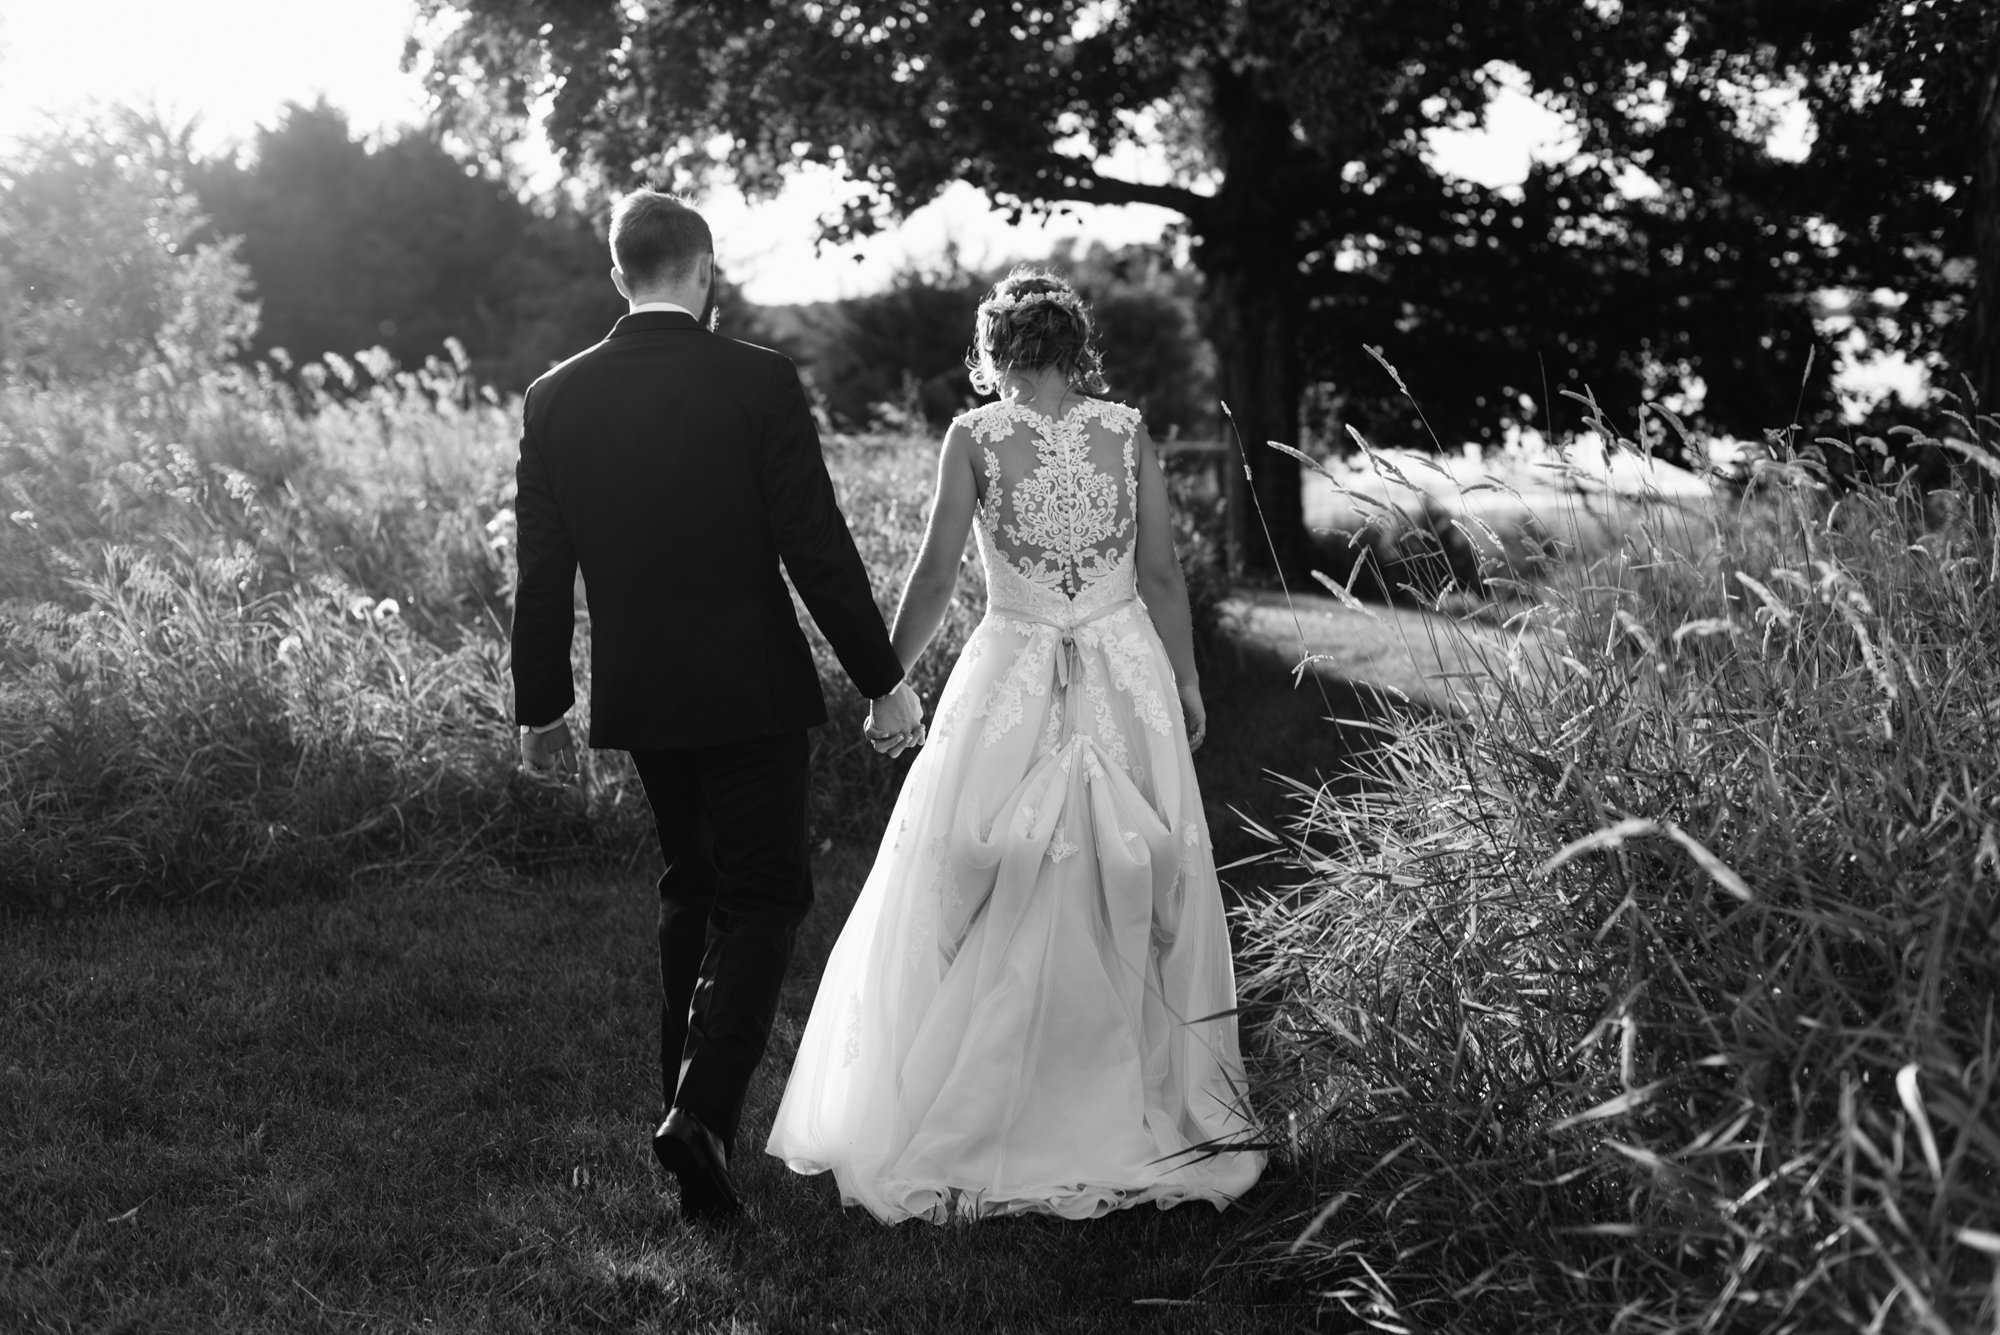 sunset-wedding-photography-1-2.jpg